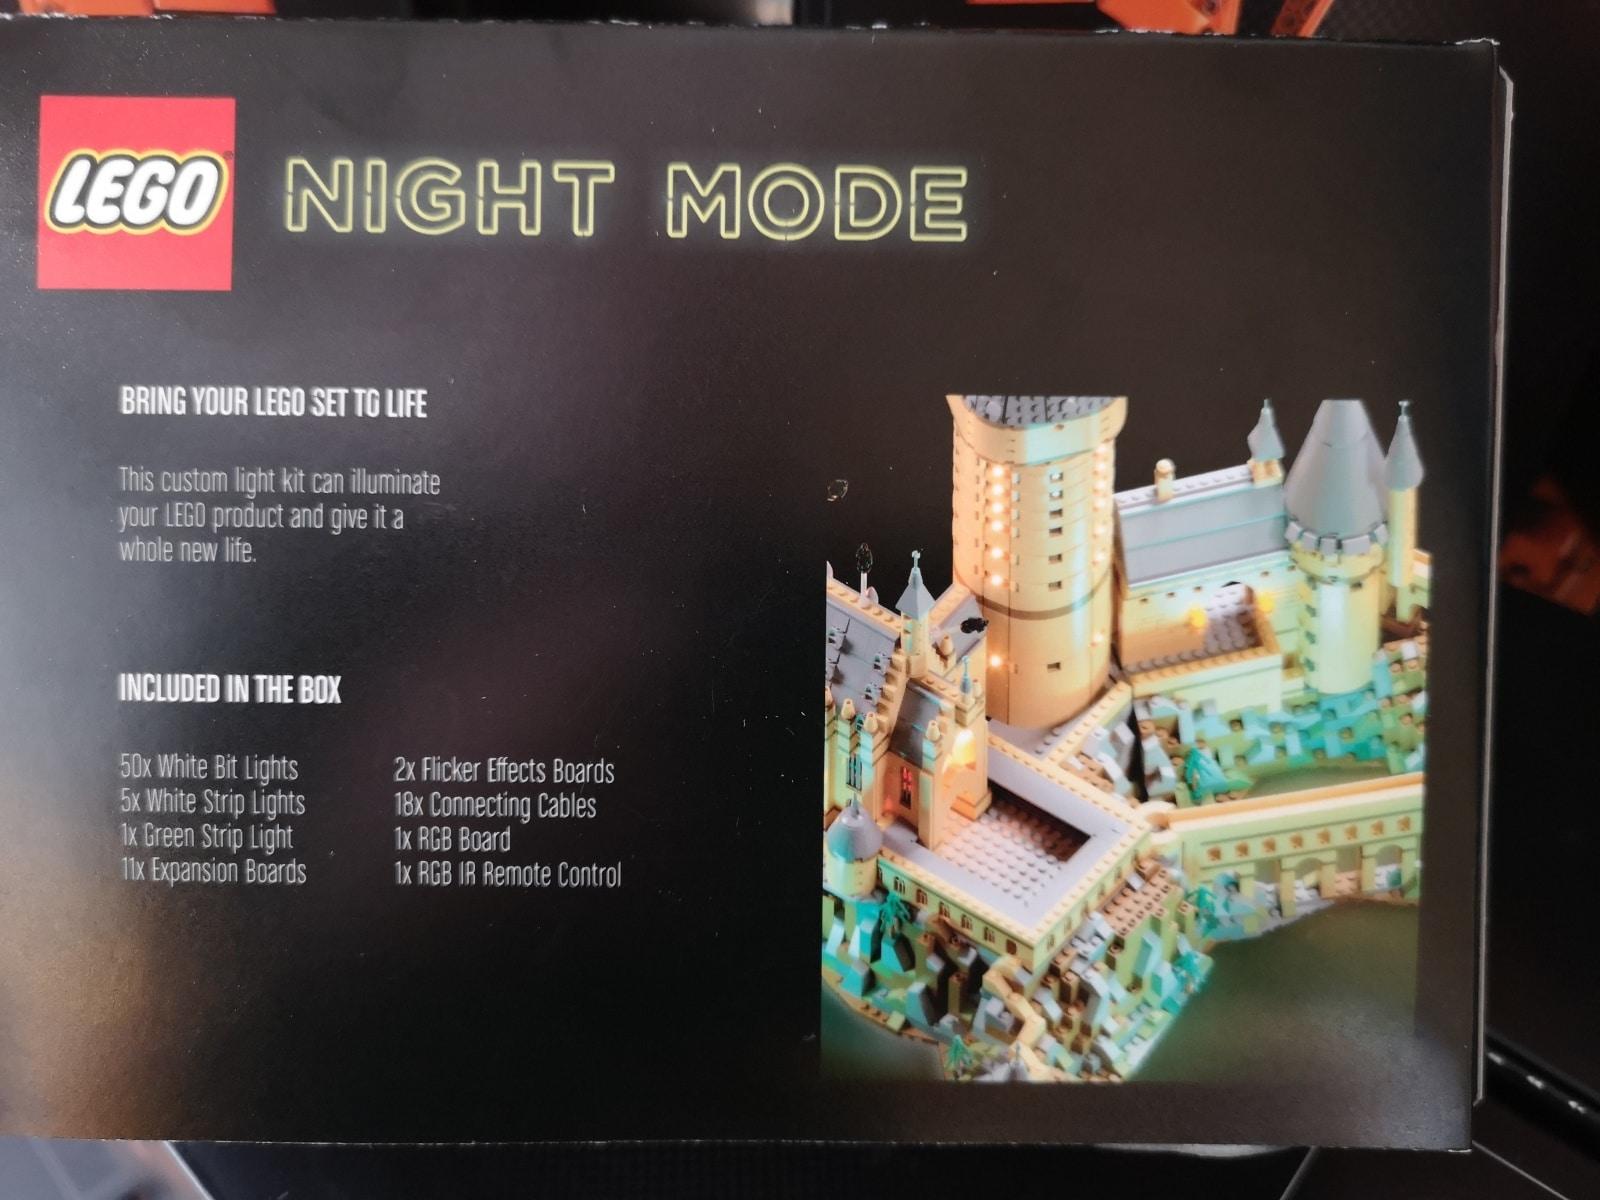 https://www.stonewars.de/wp-content/uploads/2020/02/lego-night-mode-led-sets-2.jpg